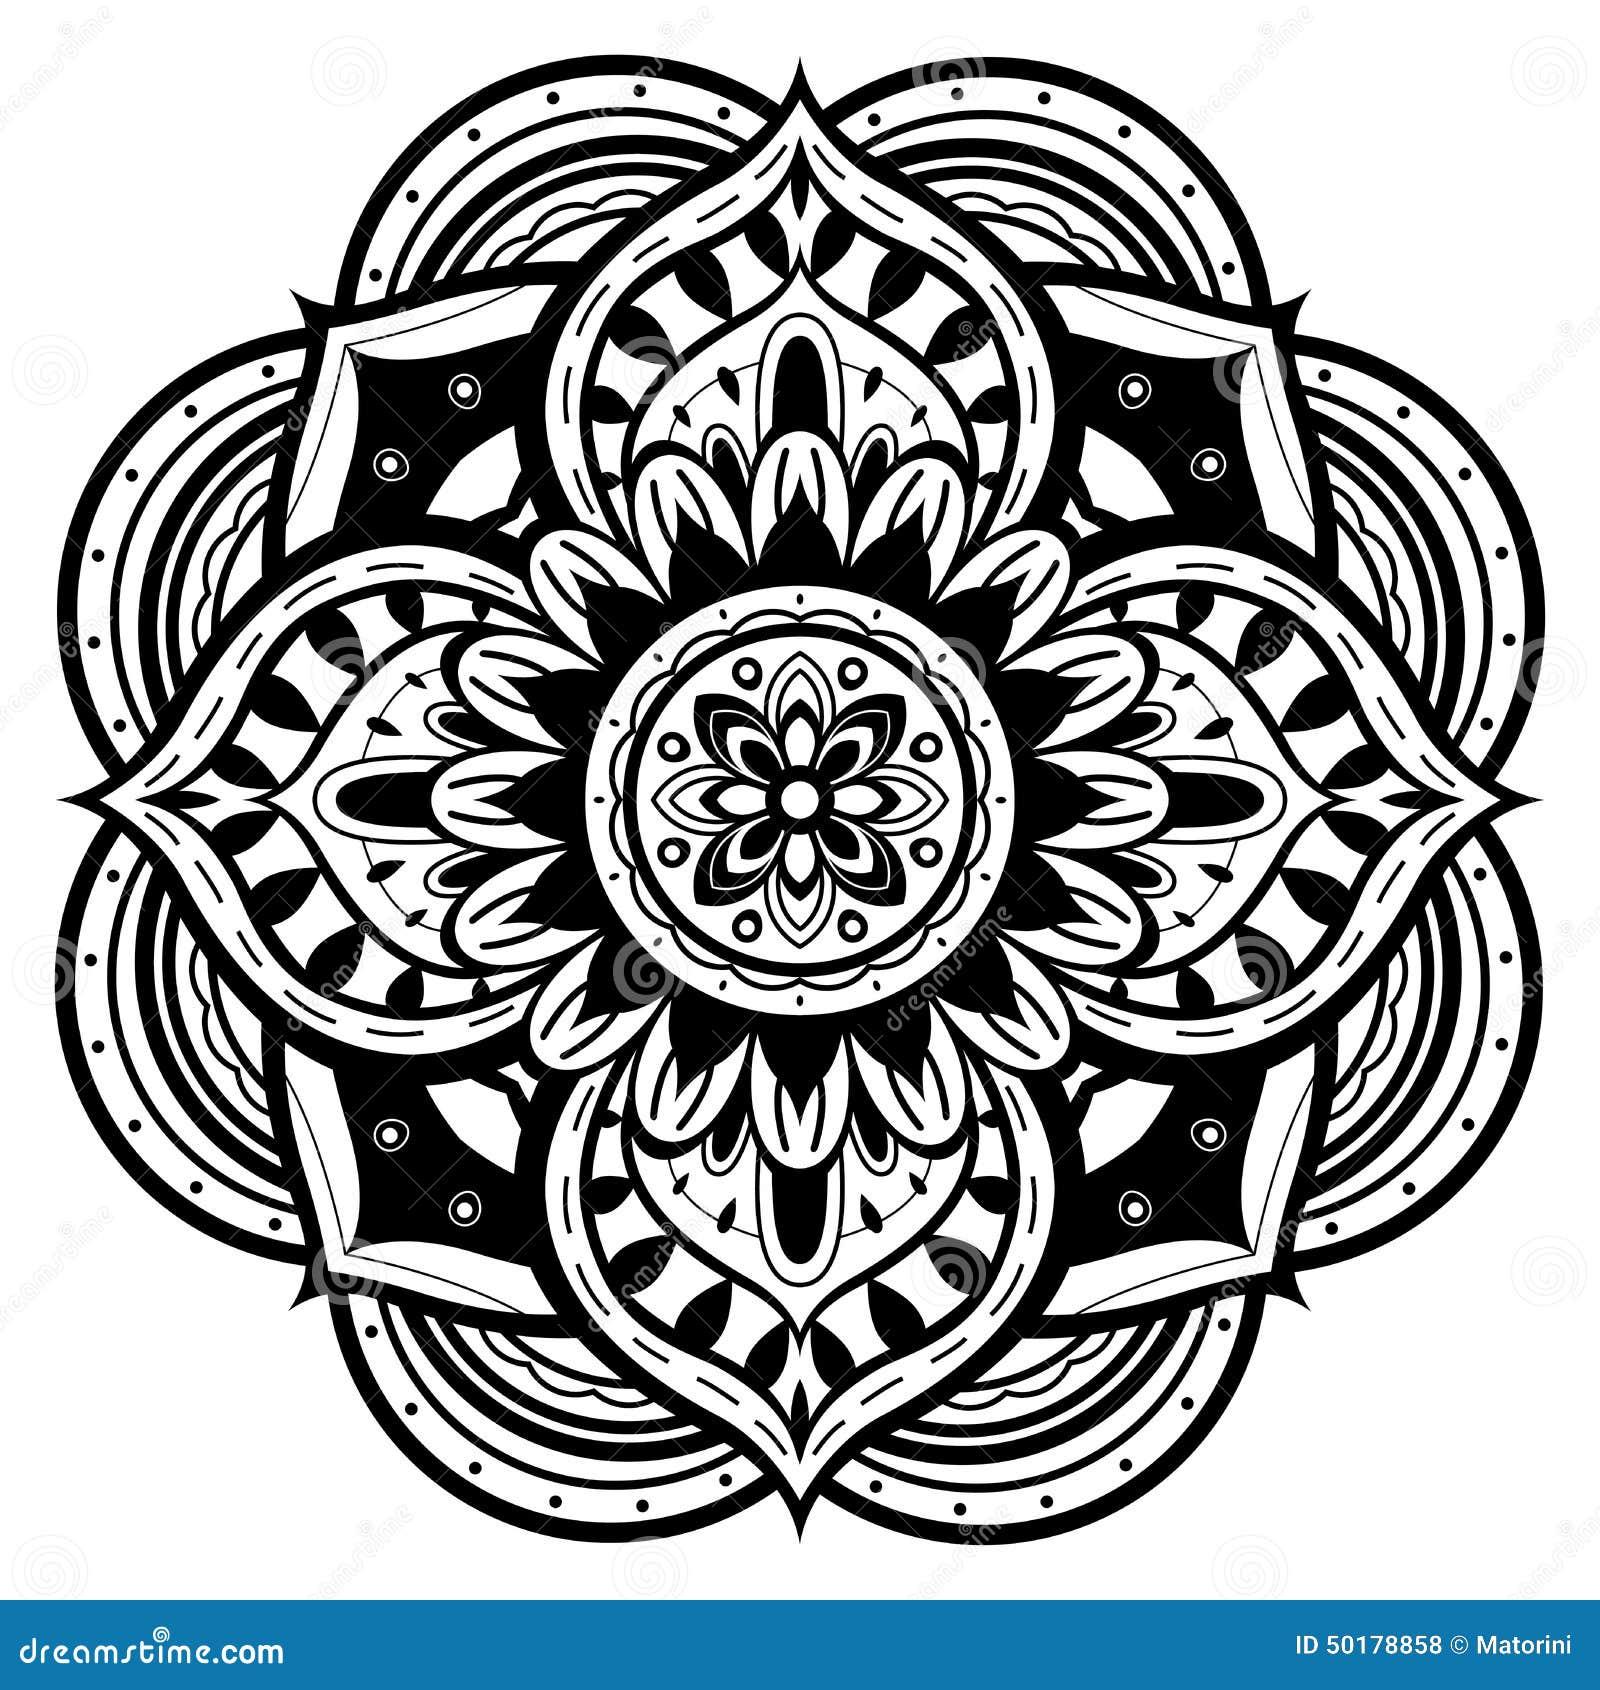 Mandala Phone Wallpaper Black and White  Phone wallpapers